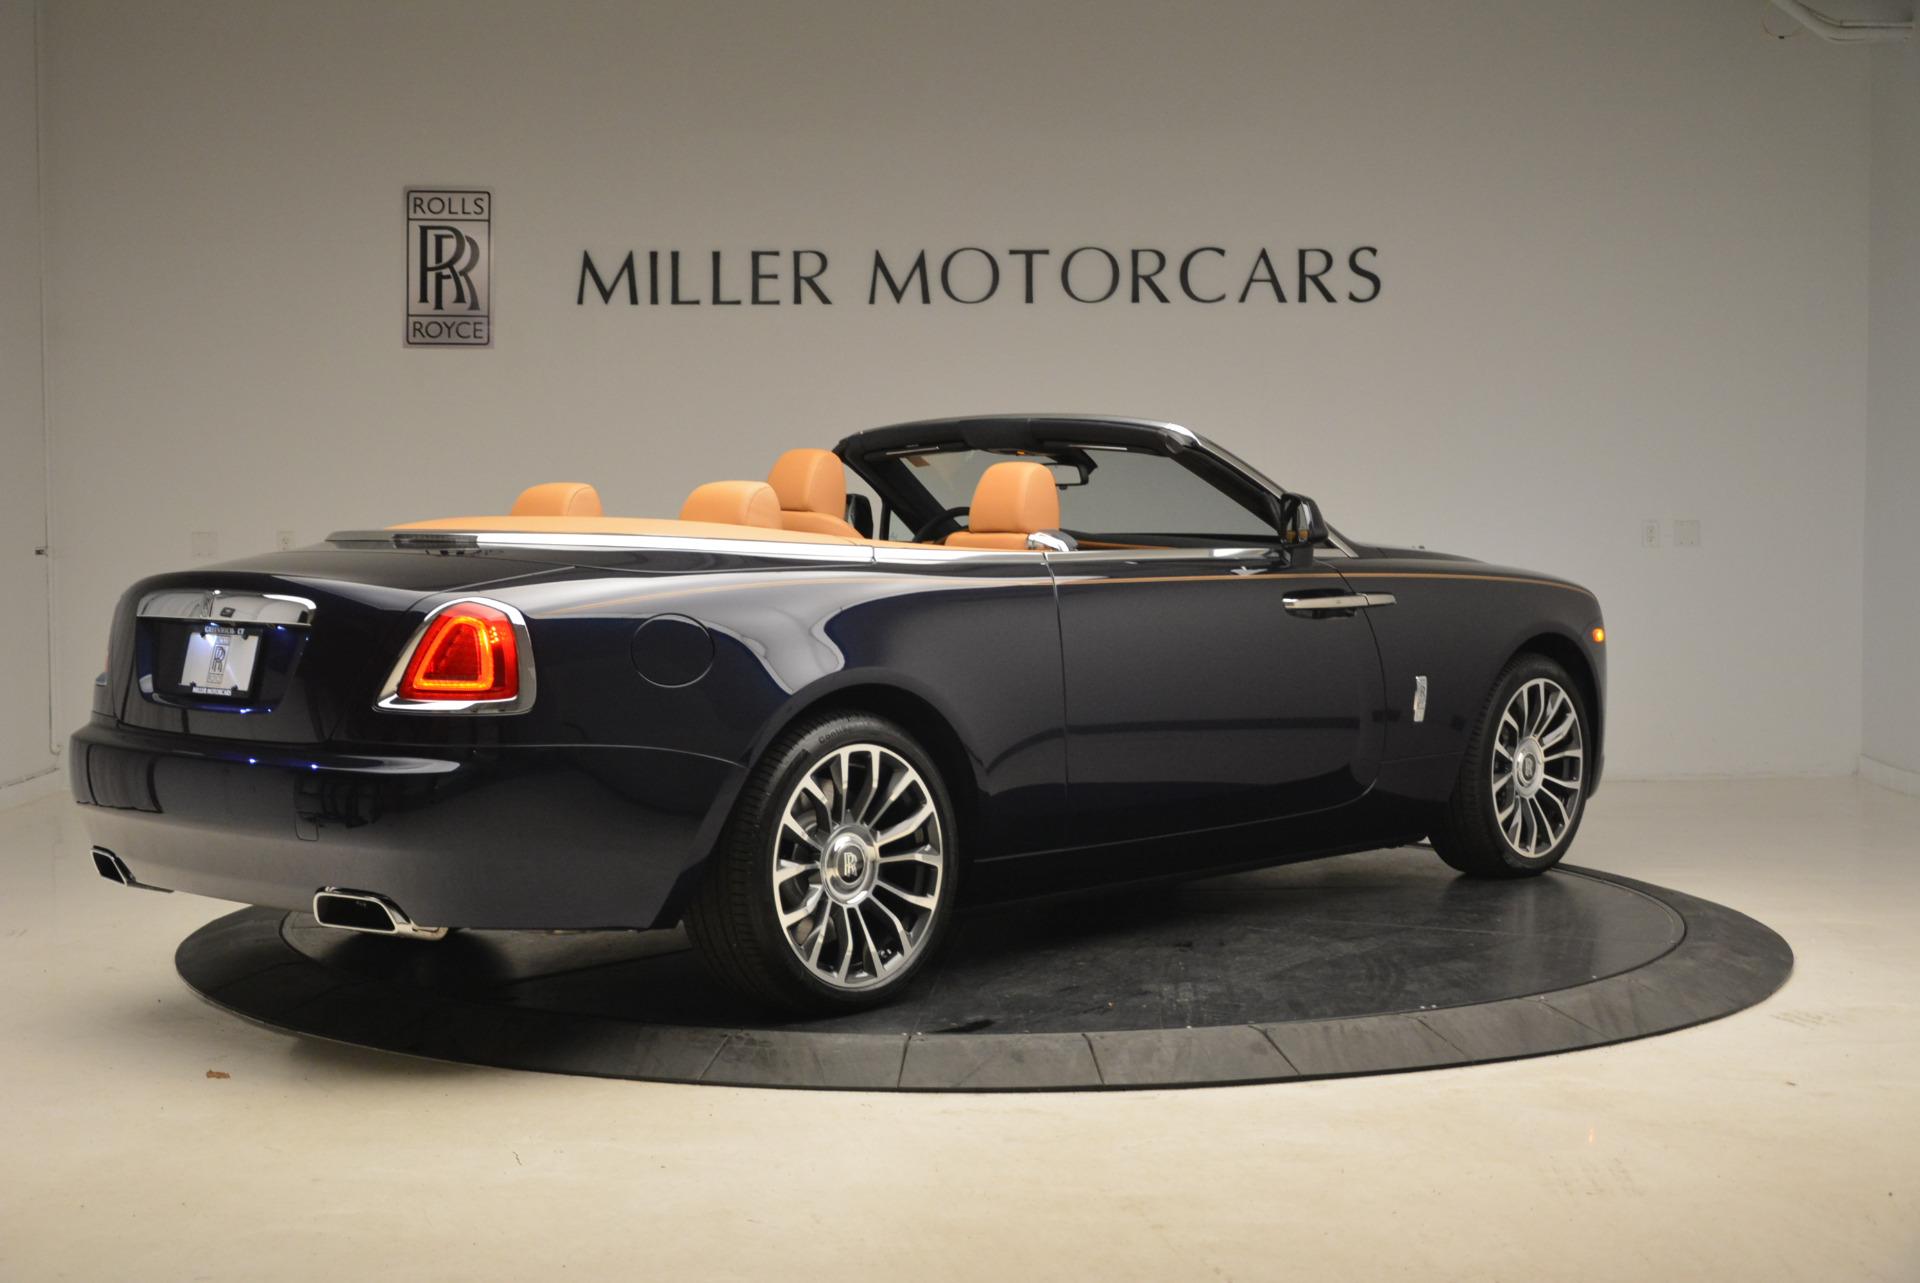 New 2018 Rolls-Royce Dawn  For Sale In Greenwich, CT 2118_p8